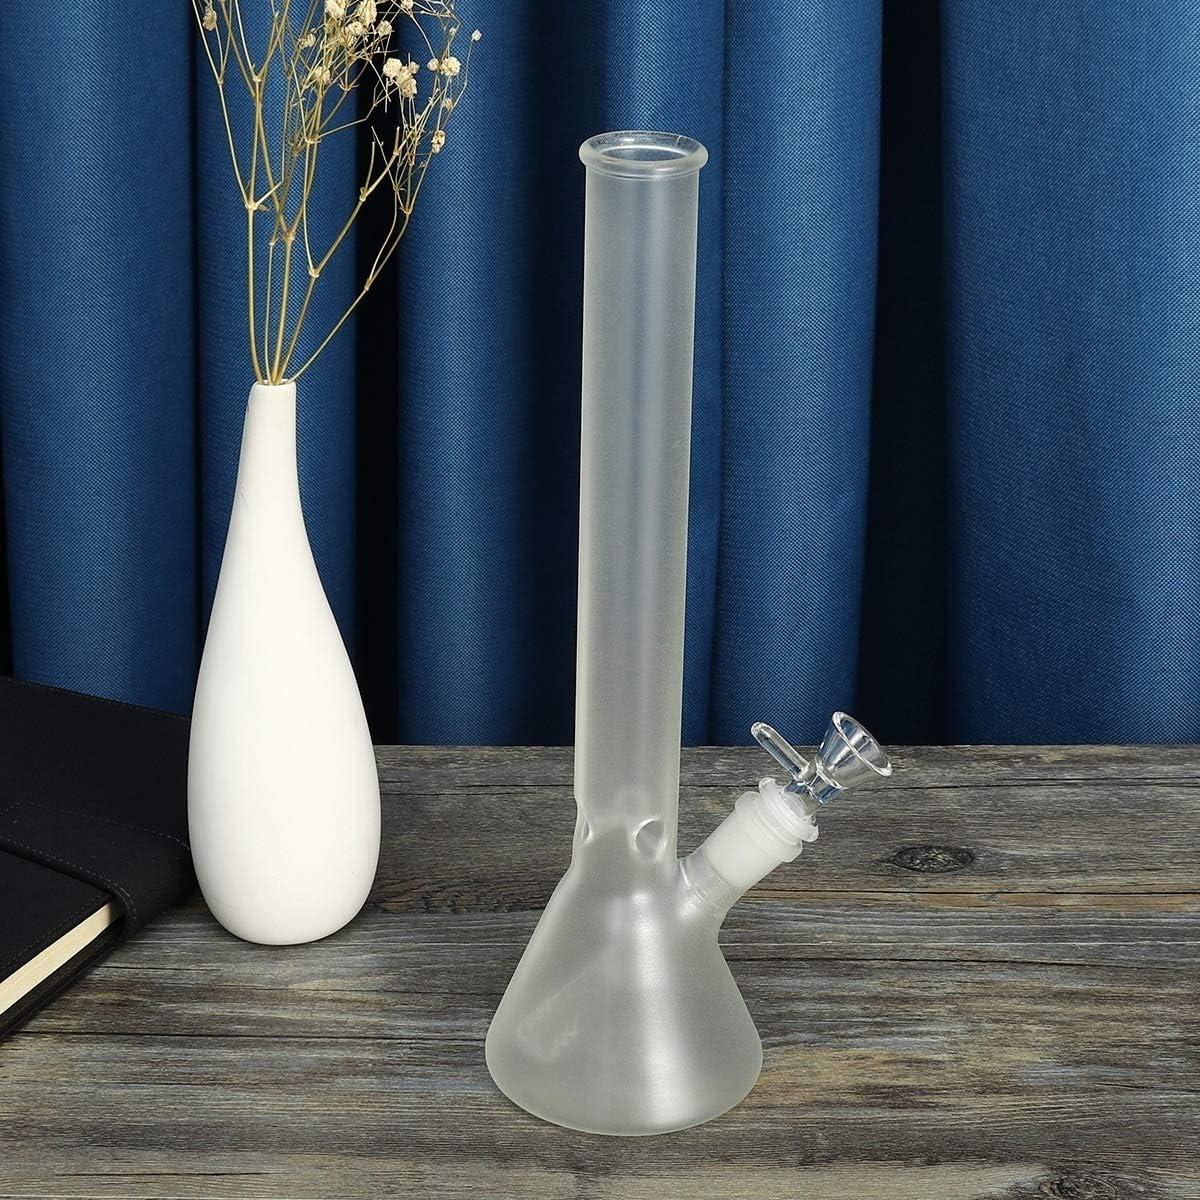 Big Water Bottle-Man Women Boys SgooYi 12.5 inch Home Decorative Bottle Glass Vase Green Handmade Glass Crafts